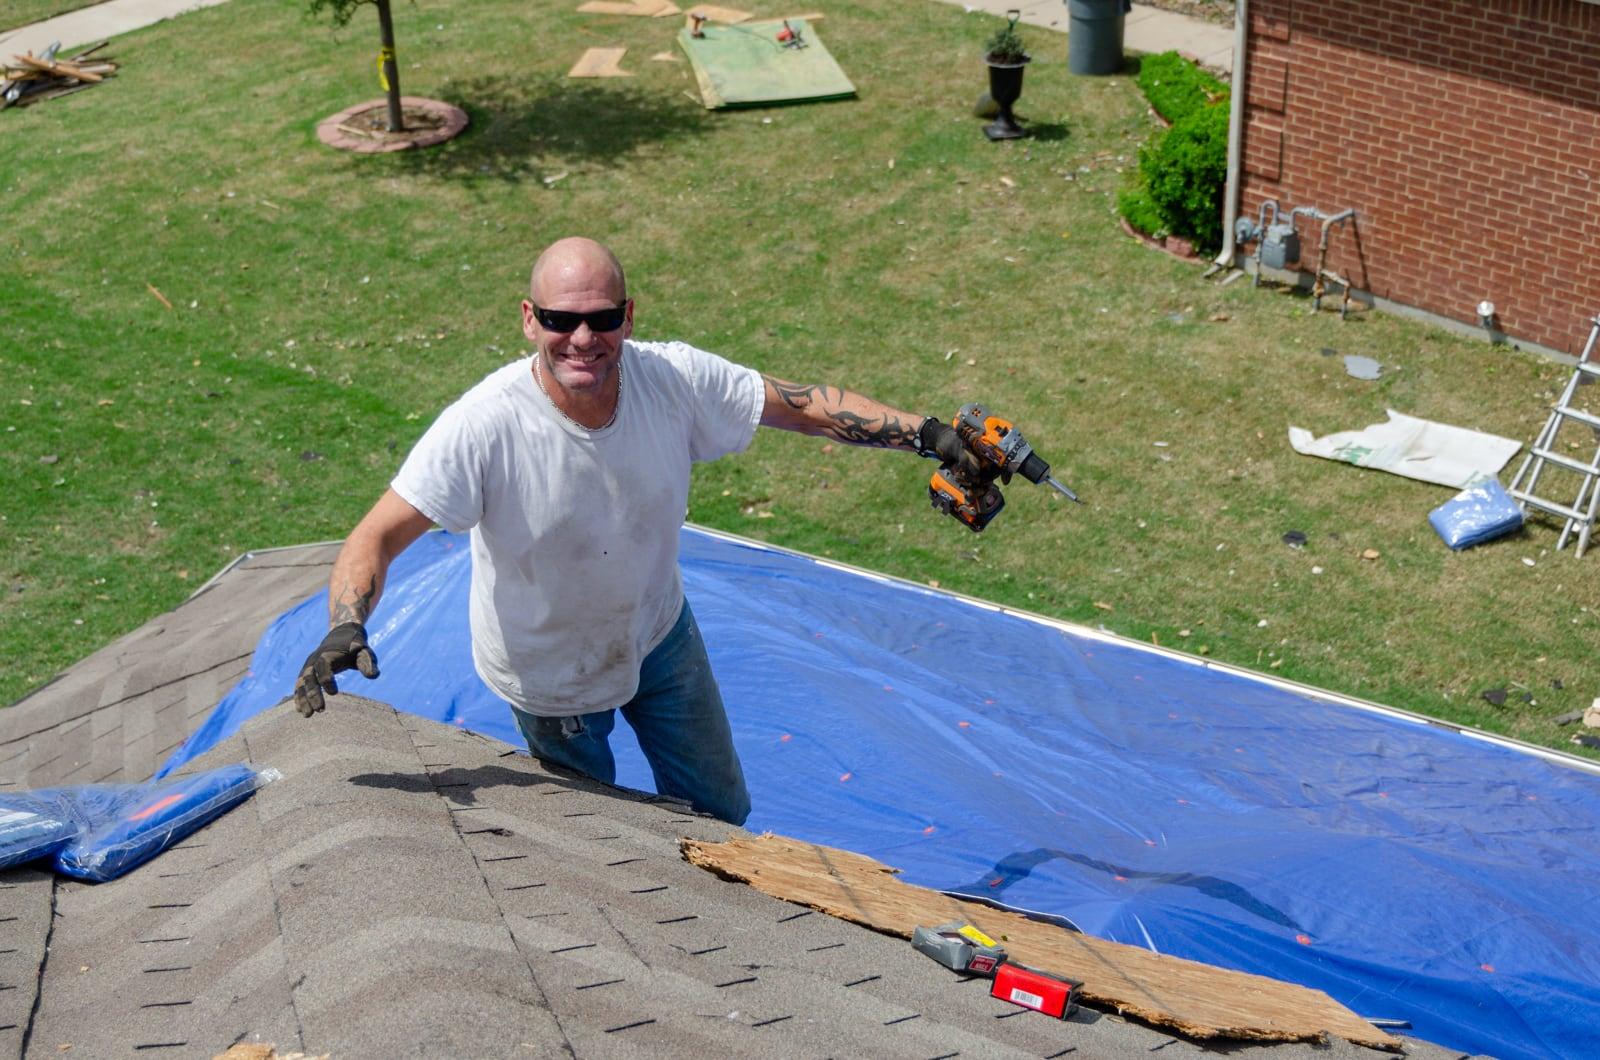 A man helping repair his friend's roof